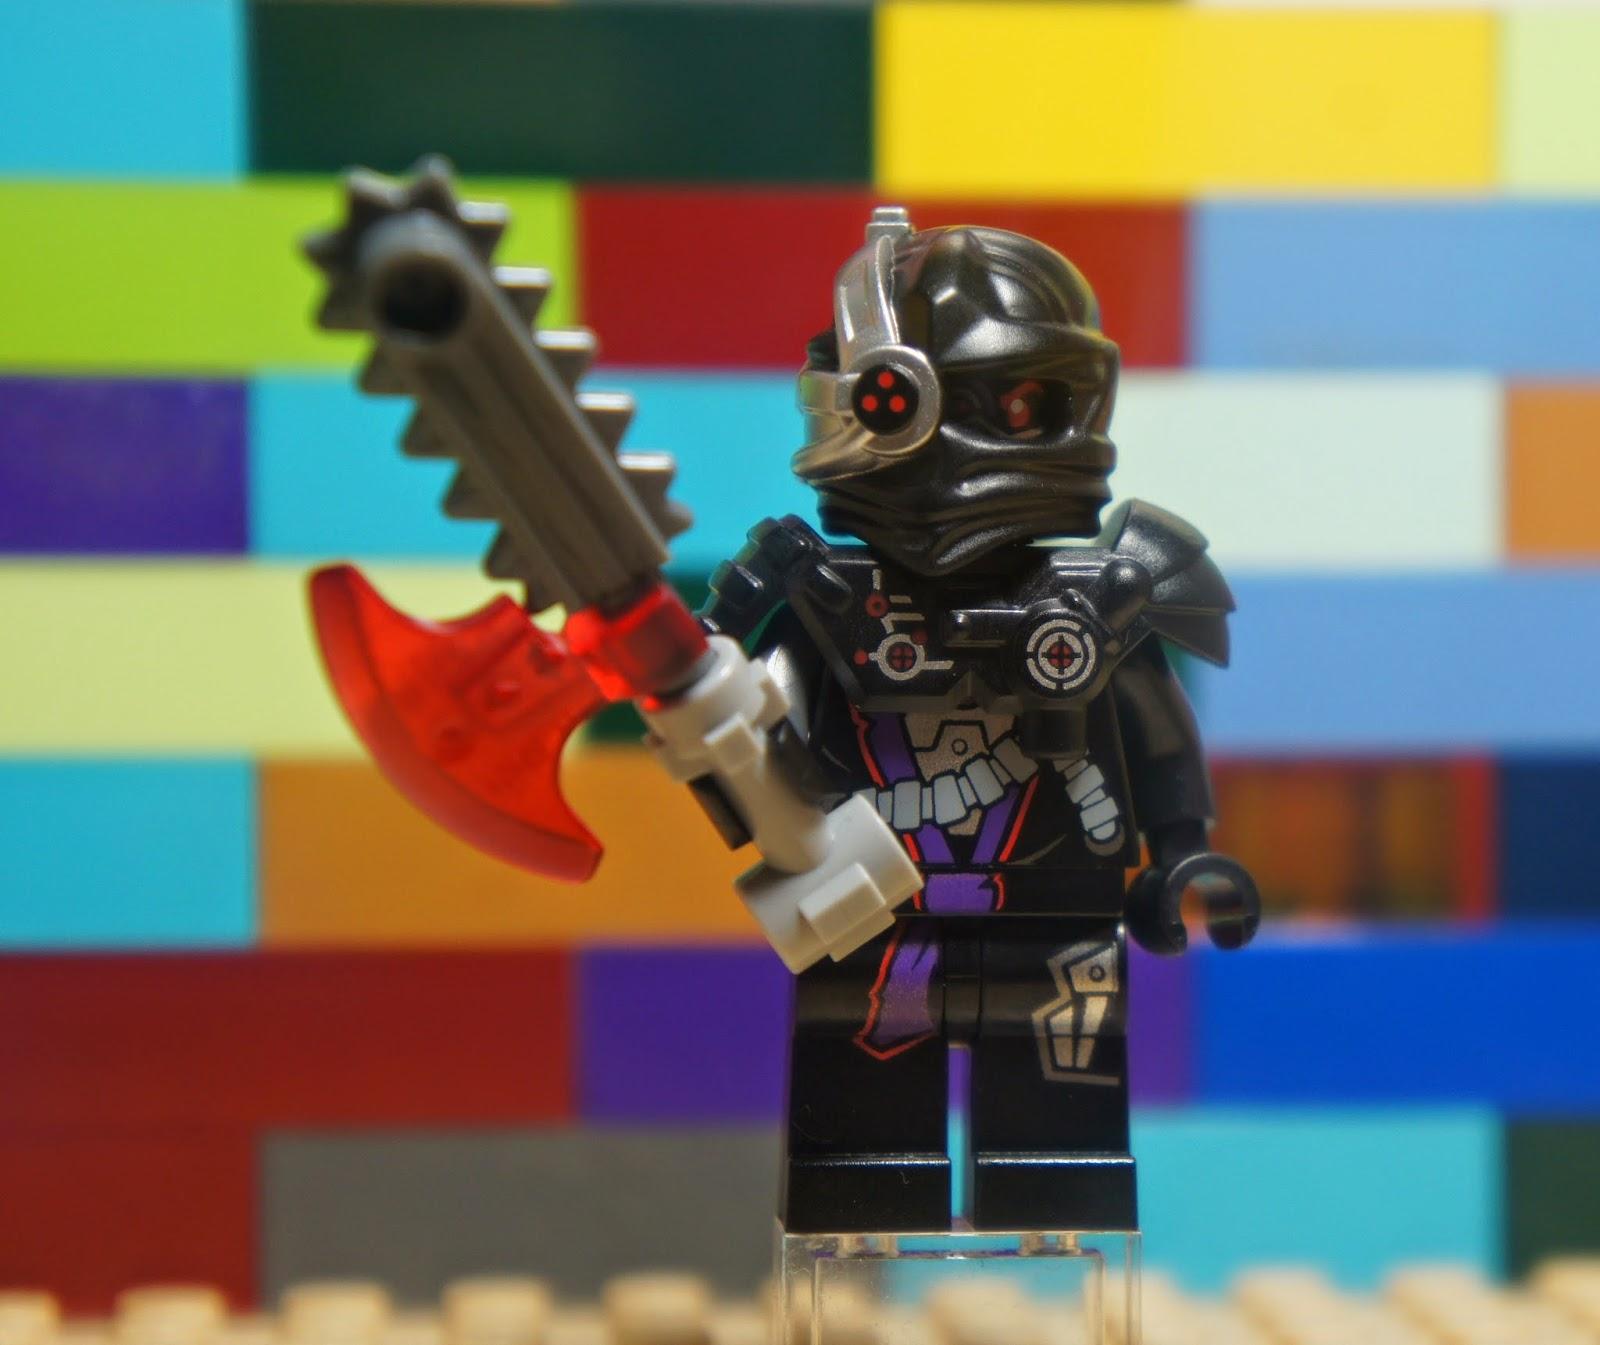 Lego Njo092 Ninjago General Cryptor Nindroid Minifigure W Weapon